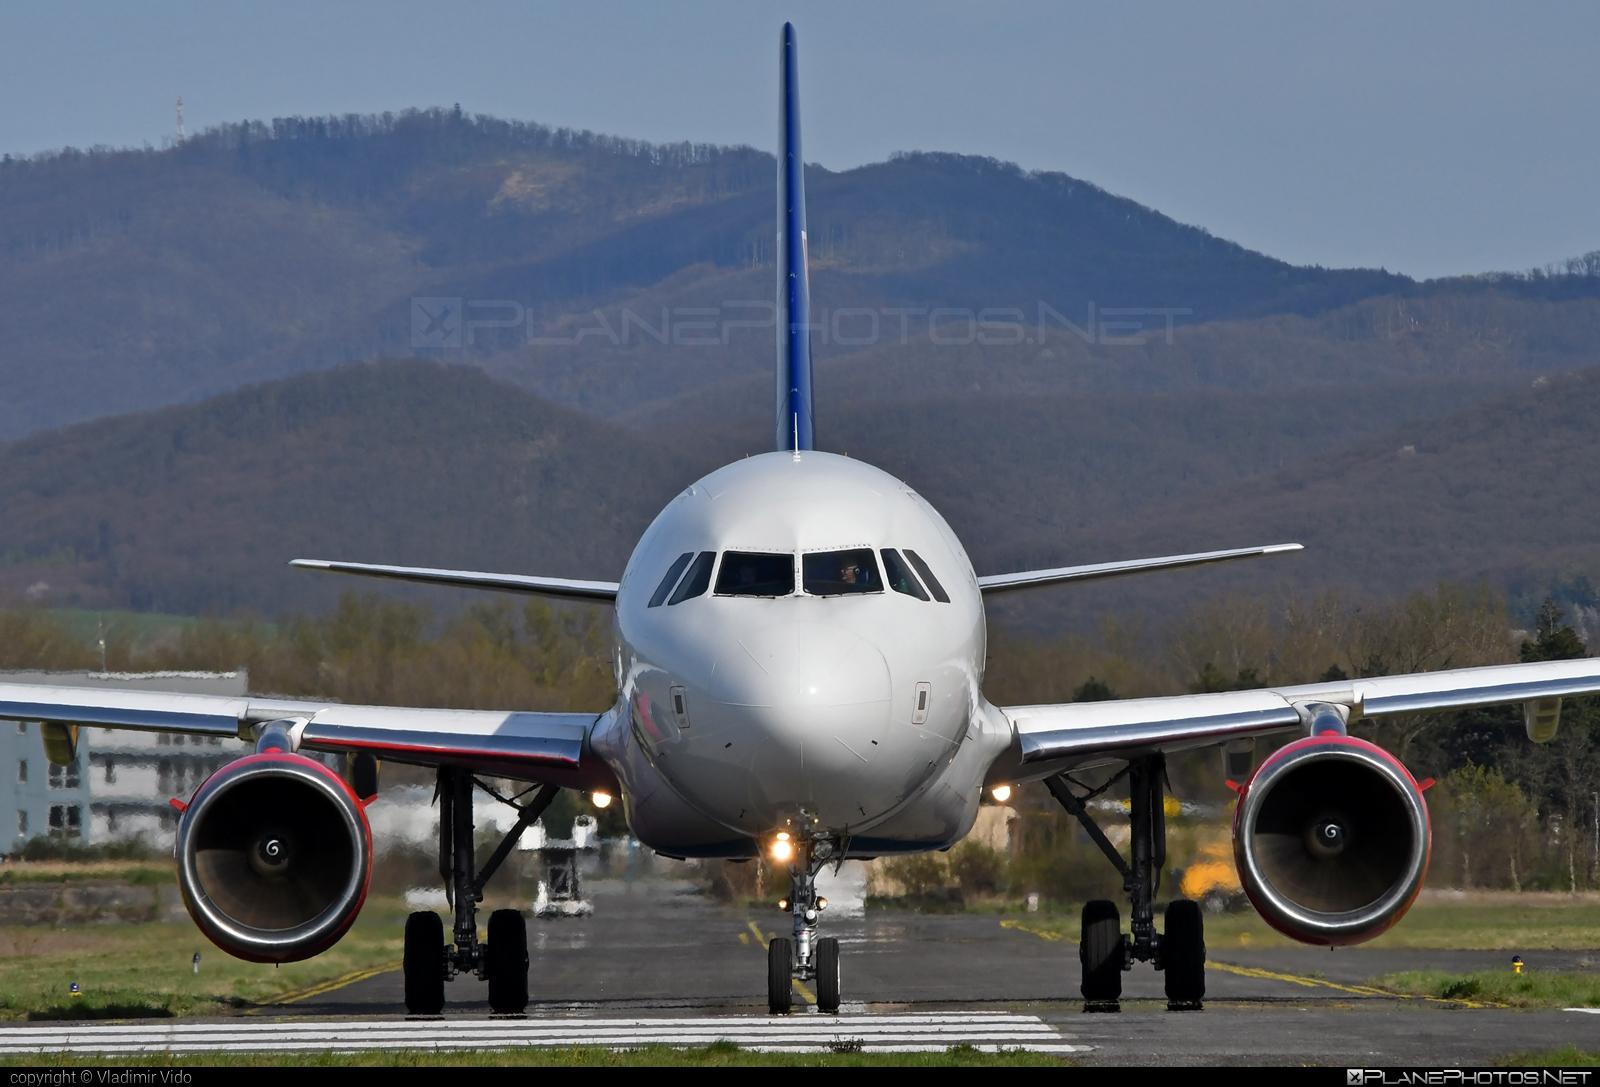 Airbus ACJ319-115 - OM-BYA operated by Letecký útvar MV SR (Slovak Government Flying Service) #SlovakGovernmentFlyingService #acj319 #acj319115 #airbus #airbuscorporatejet #leteckyutvarMVSR